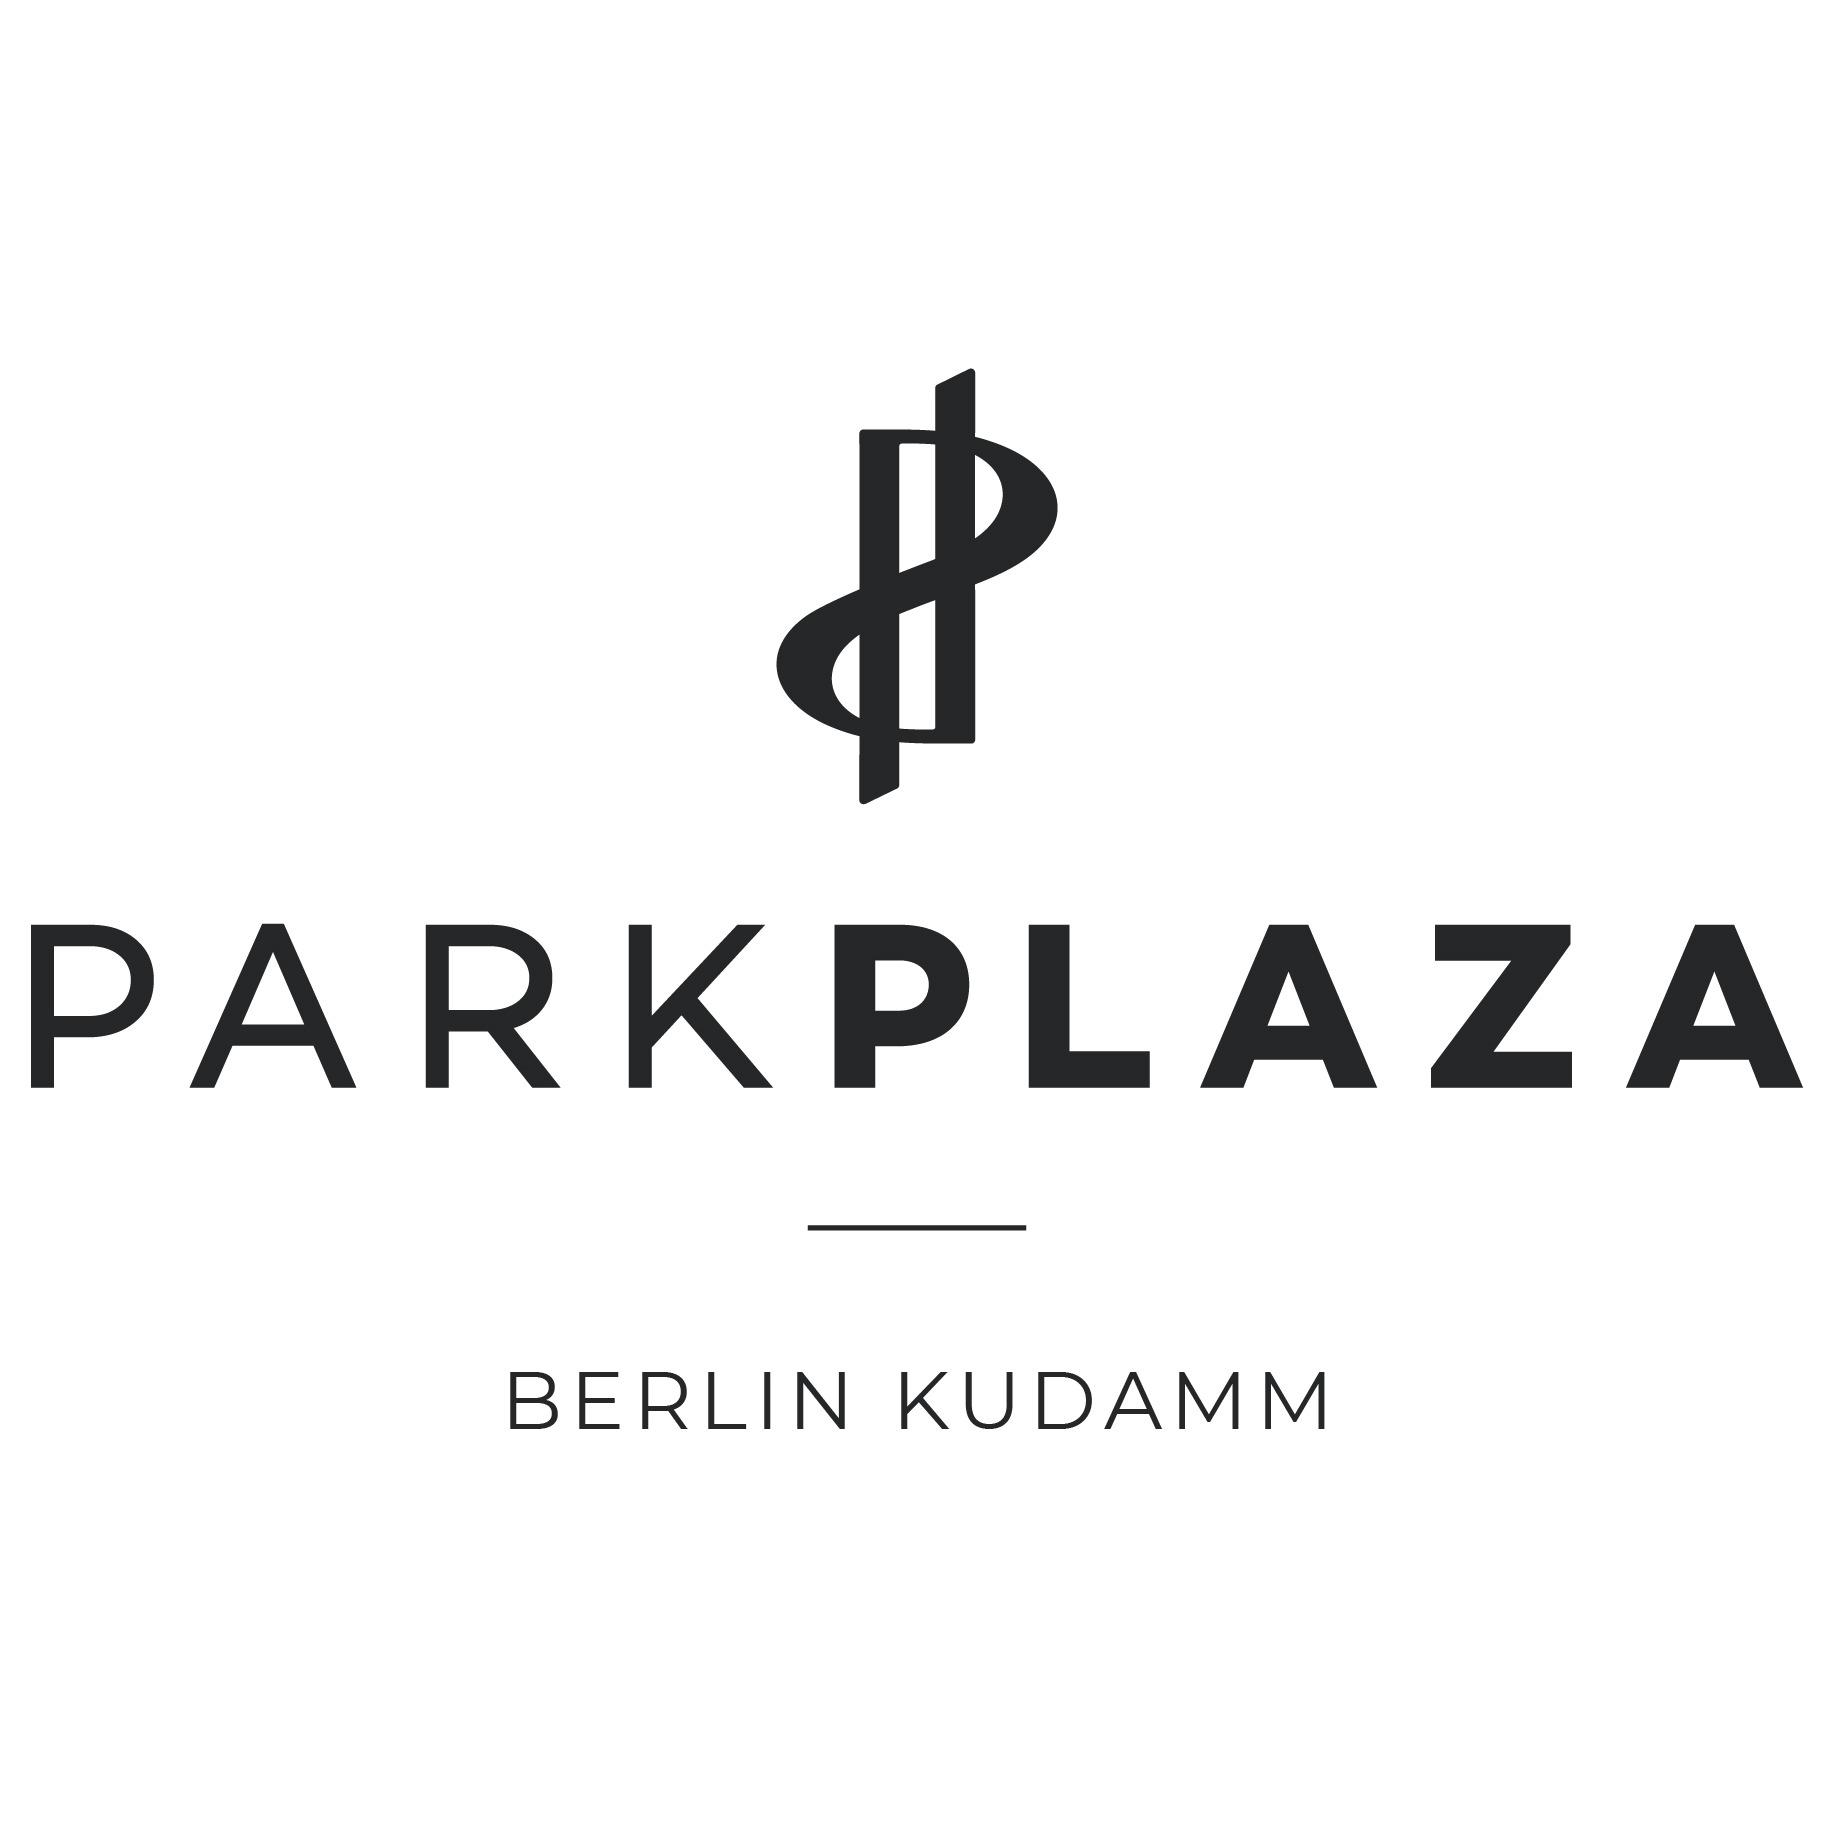 Park Plaza Berlin Kudamm